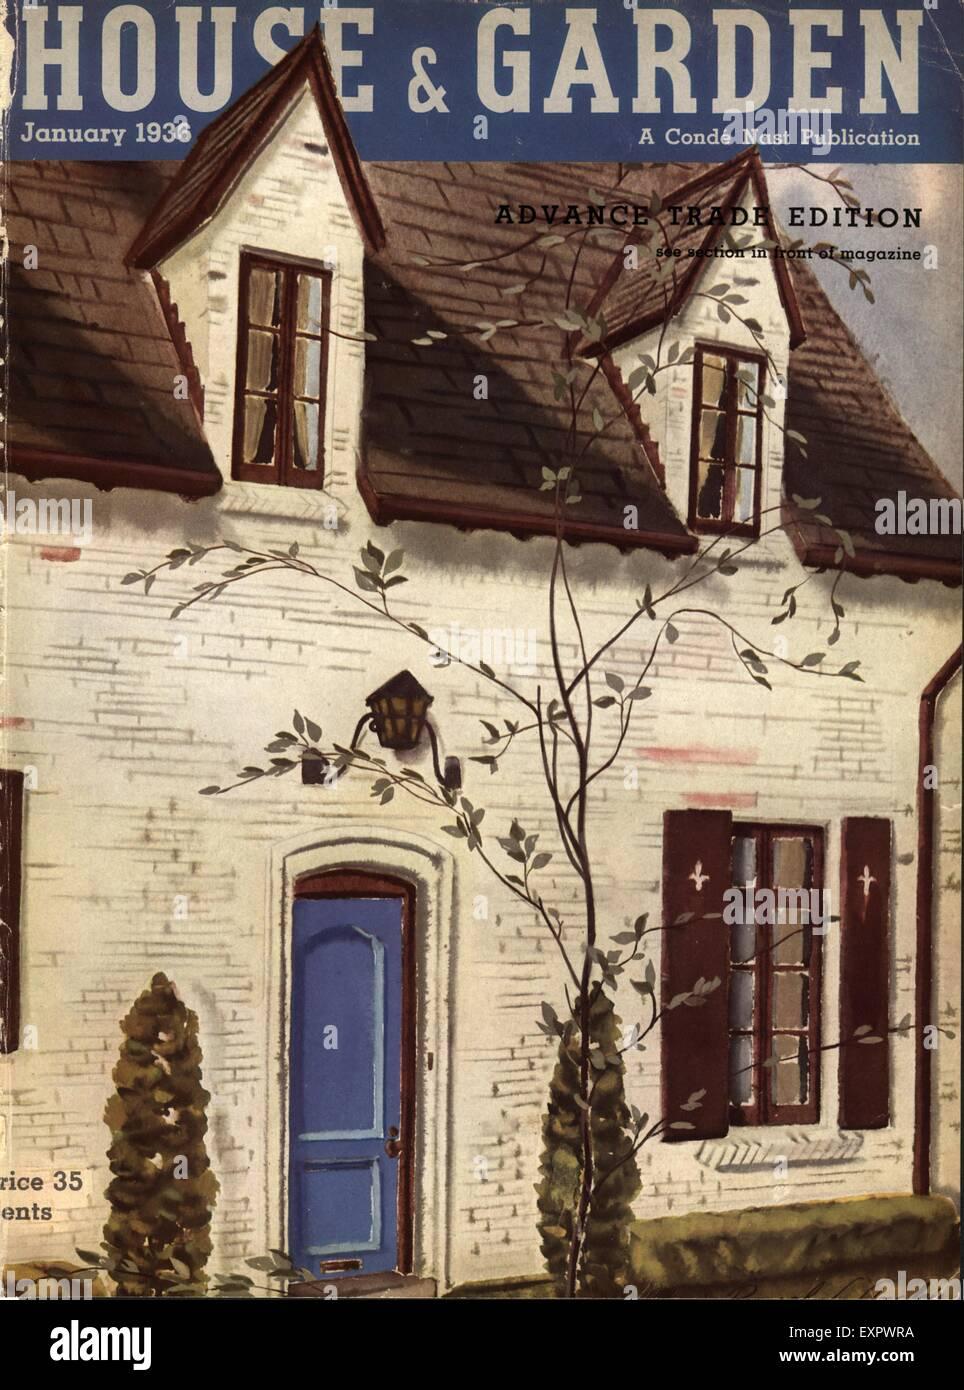 1930s USA House And Garden Magazine Cover